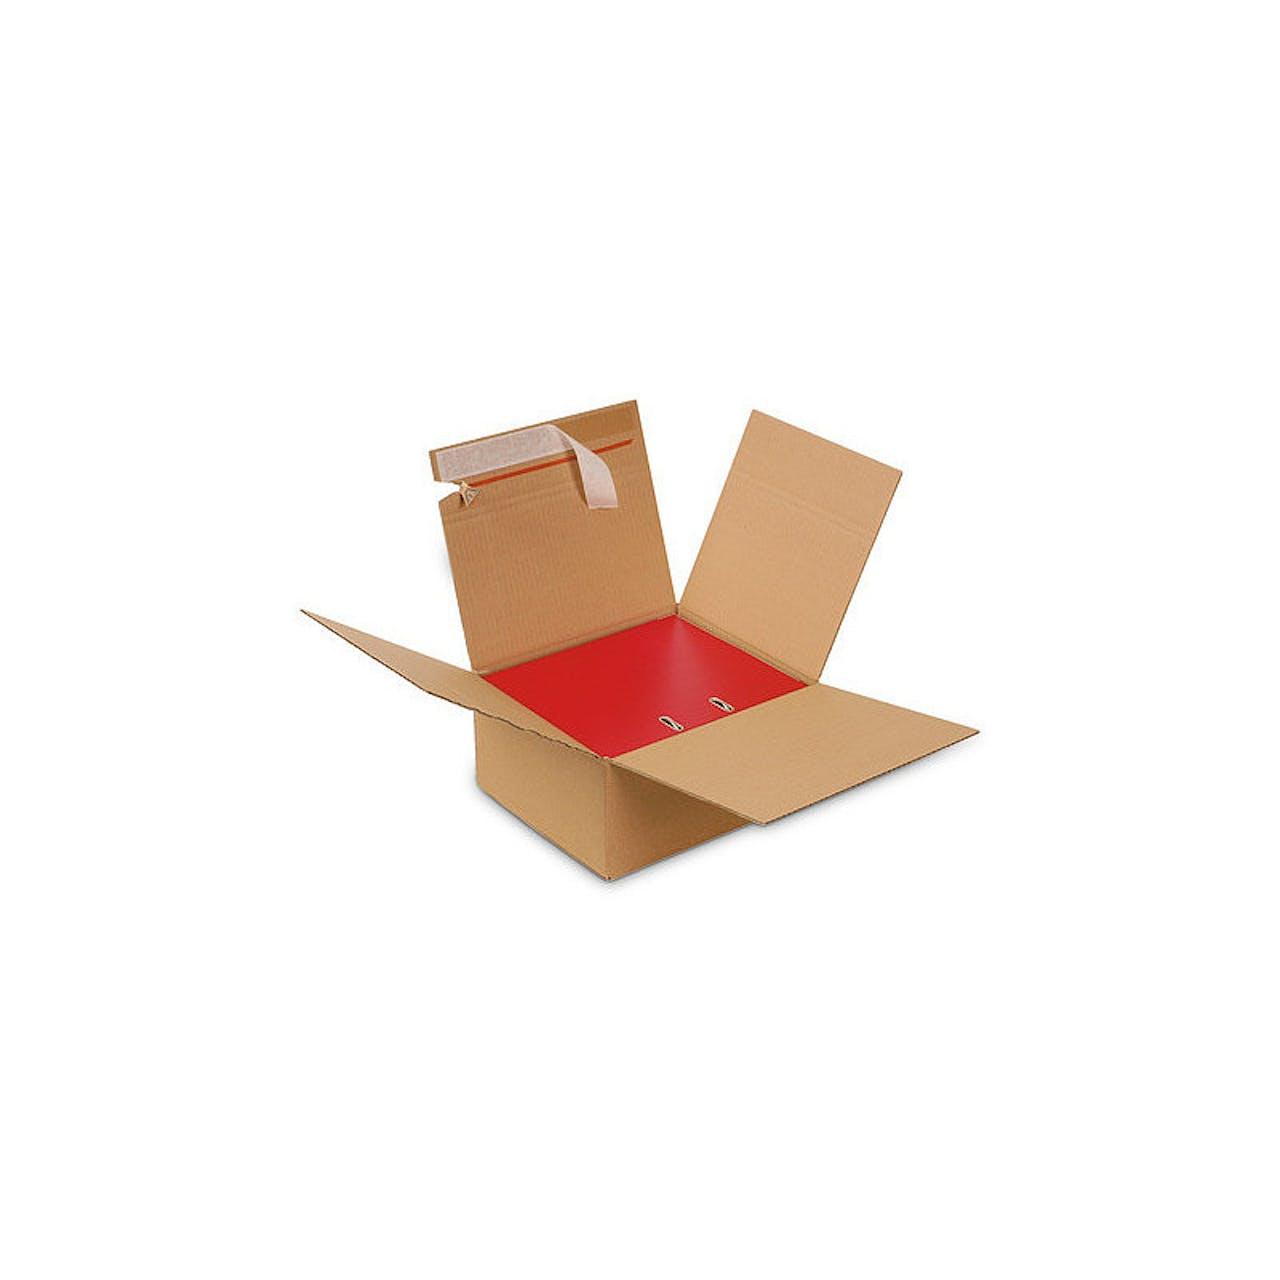 Ordner-Karton für 2–3 Ordner